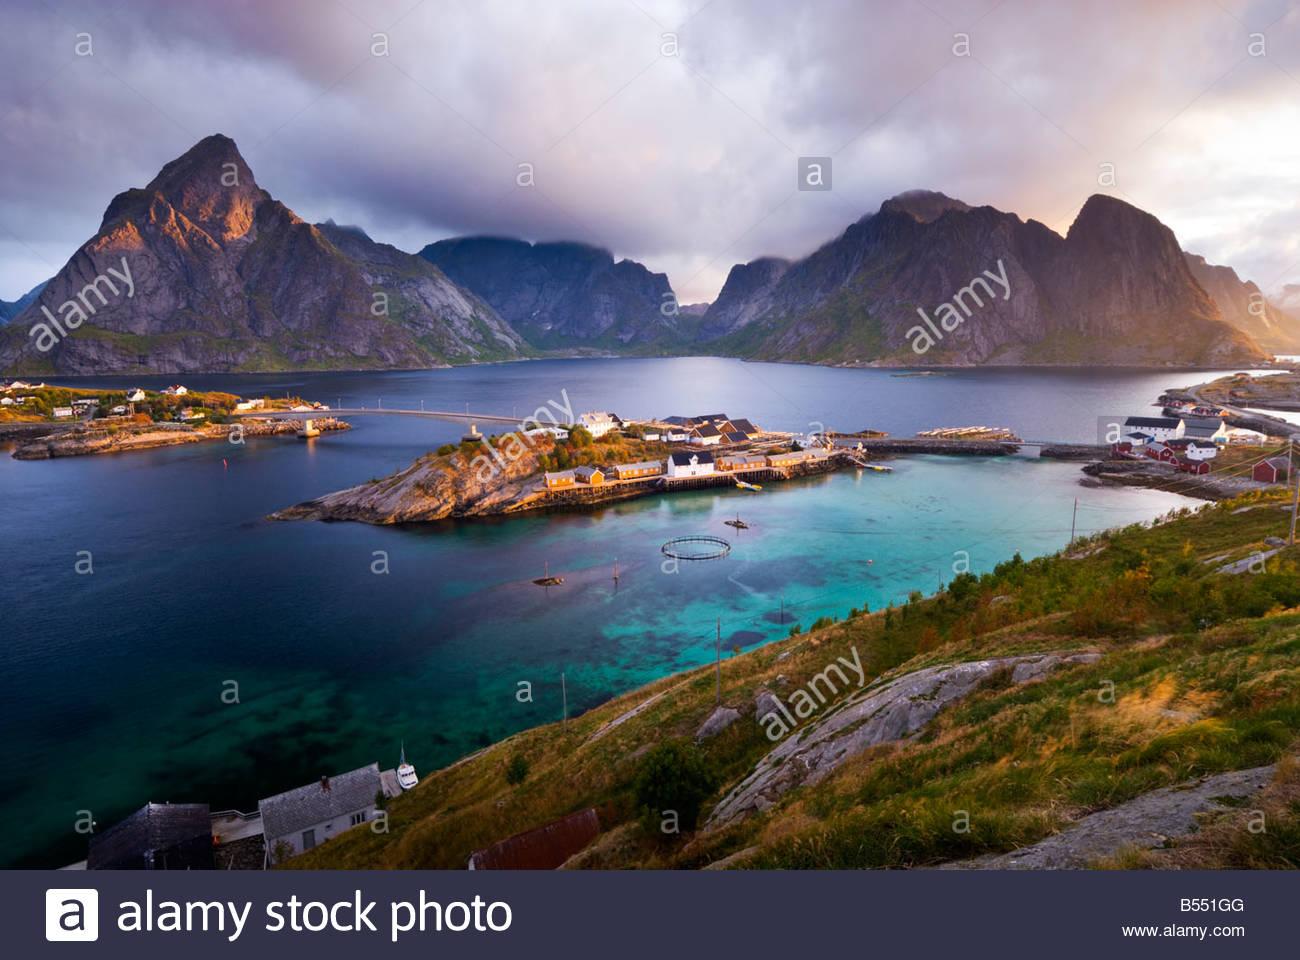 Dramatic sunrise over the hamlet of Sakrisøy, near Reine, Lofoten Islands, Norway. - Stock Image